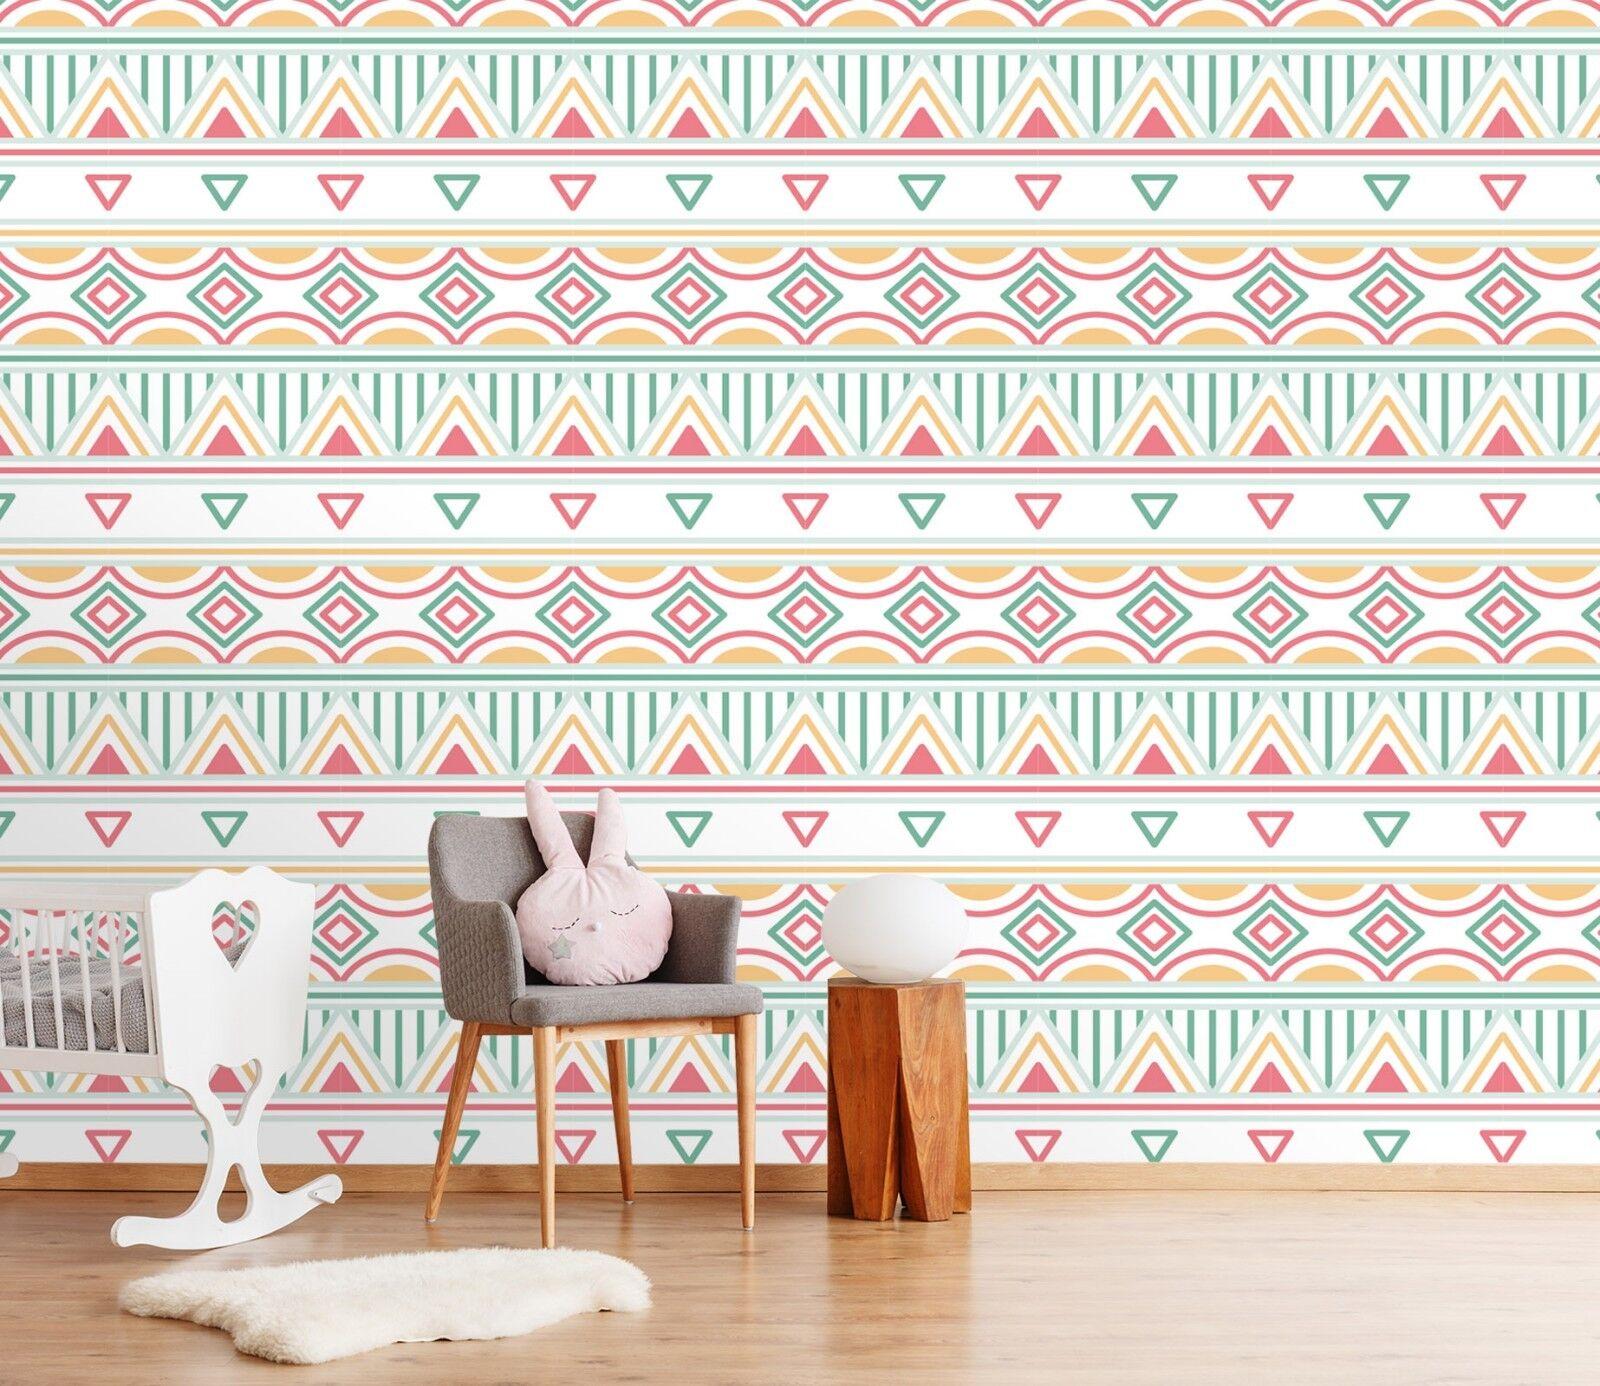 3D Triangle Pattern Art 3 Wallpaper Mural Print Wall Indoor Wallpaper Murals UK